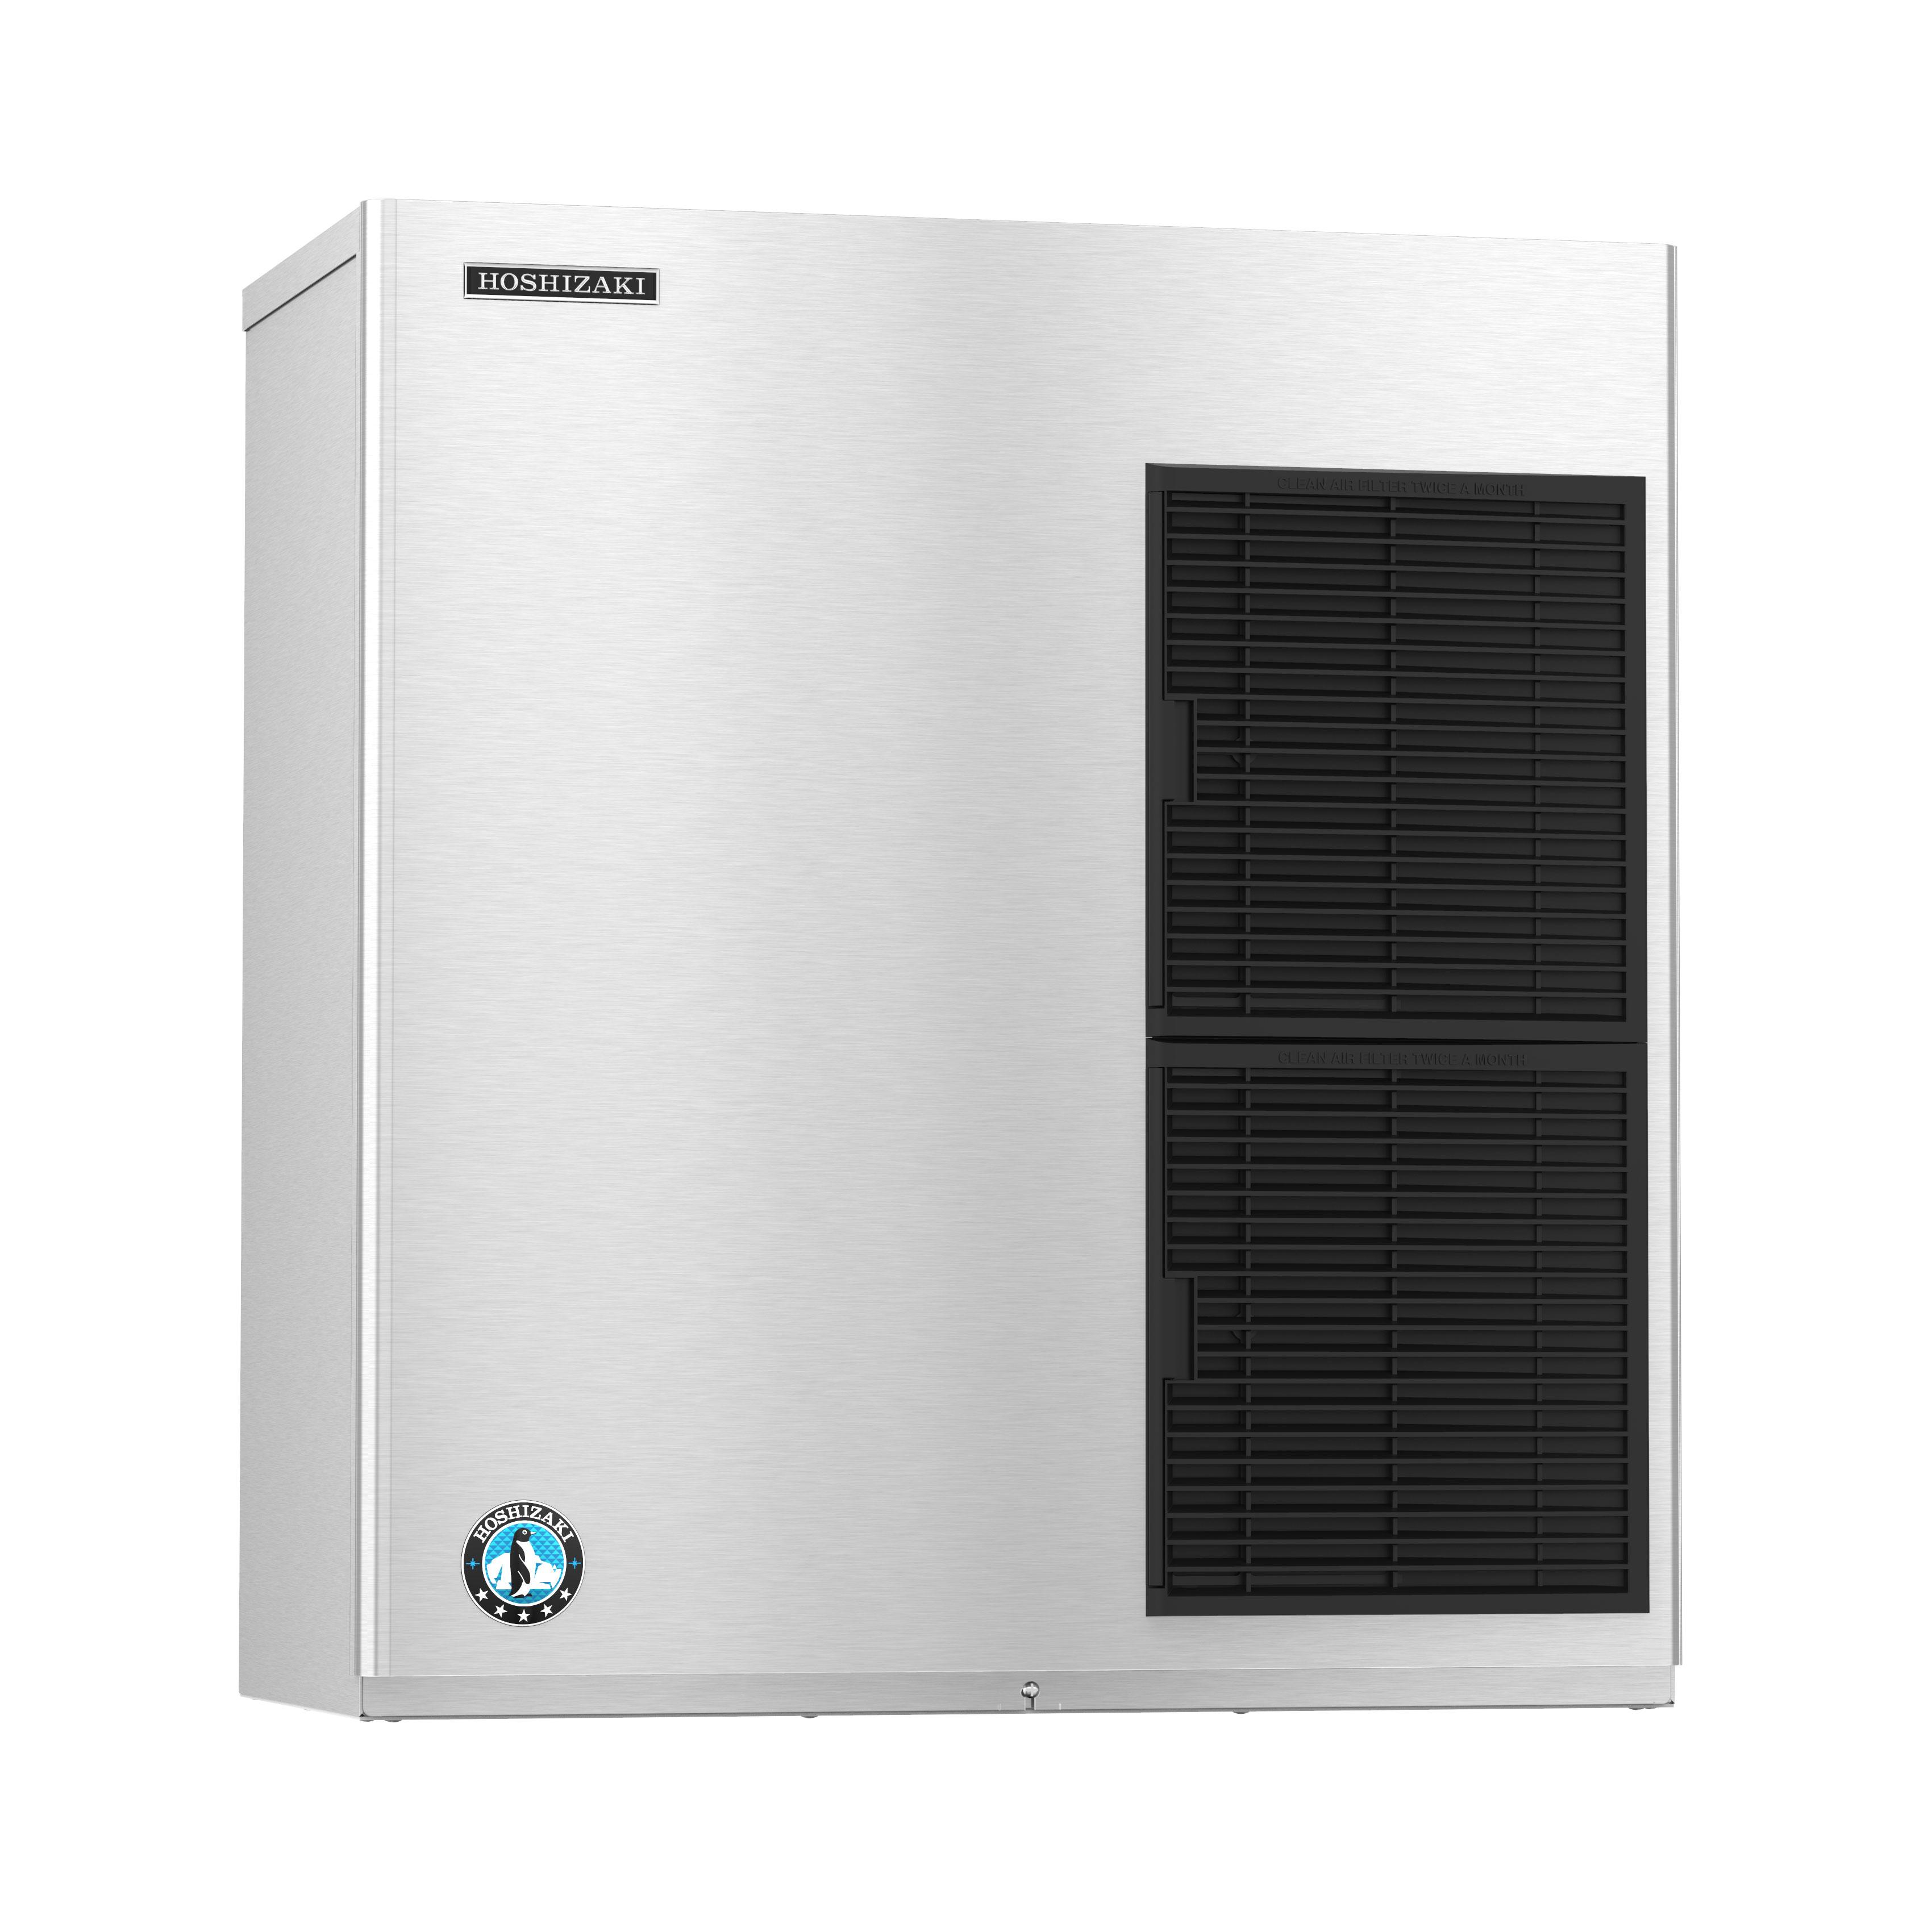 Hoshizaki FS-1501MLJ-C ice cubers, ice storage & ice dispensers